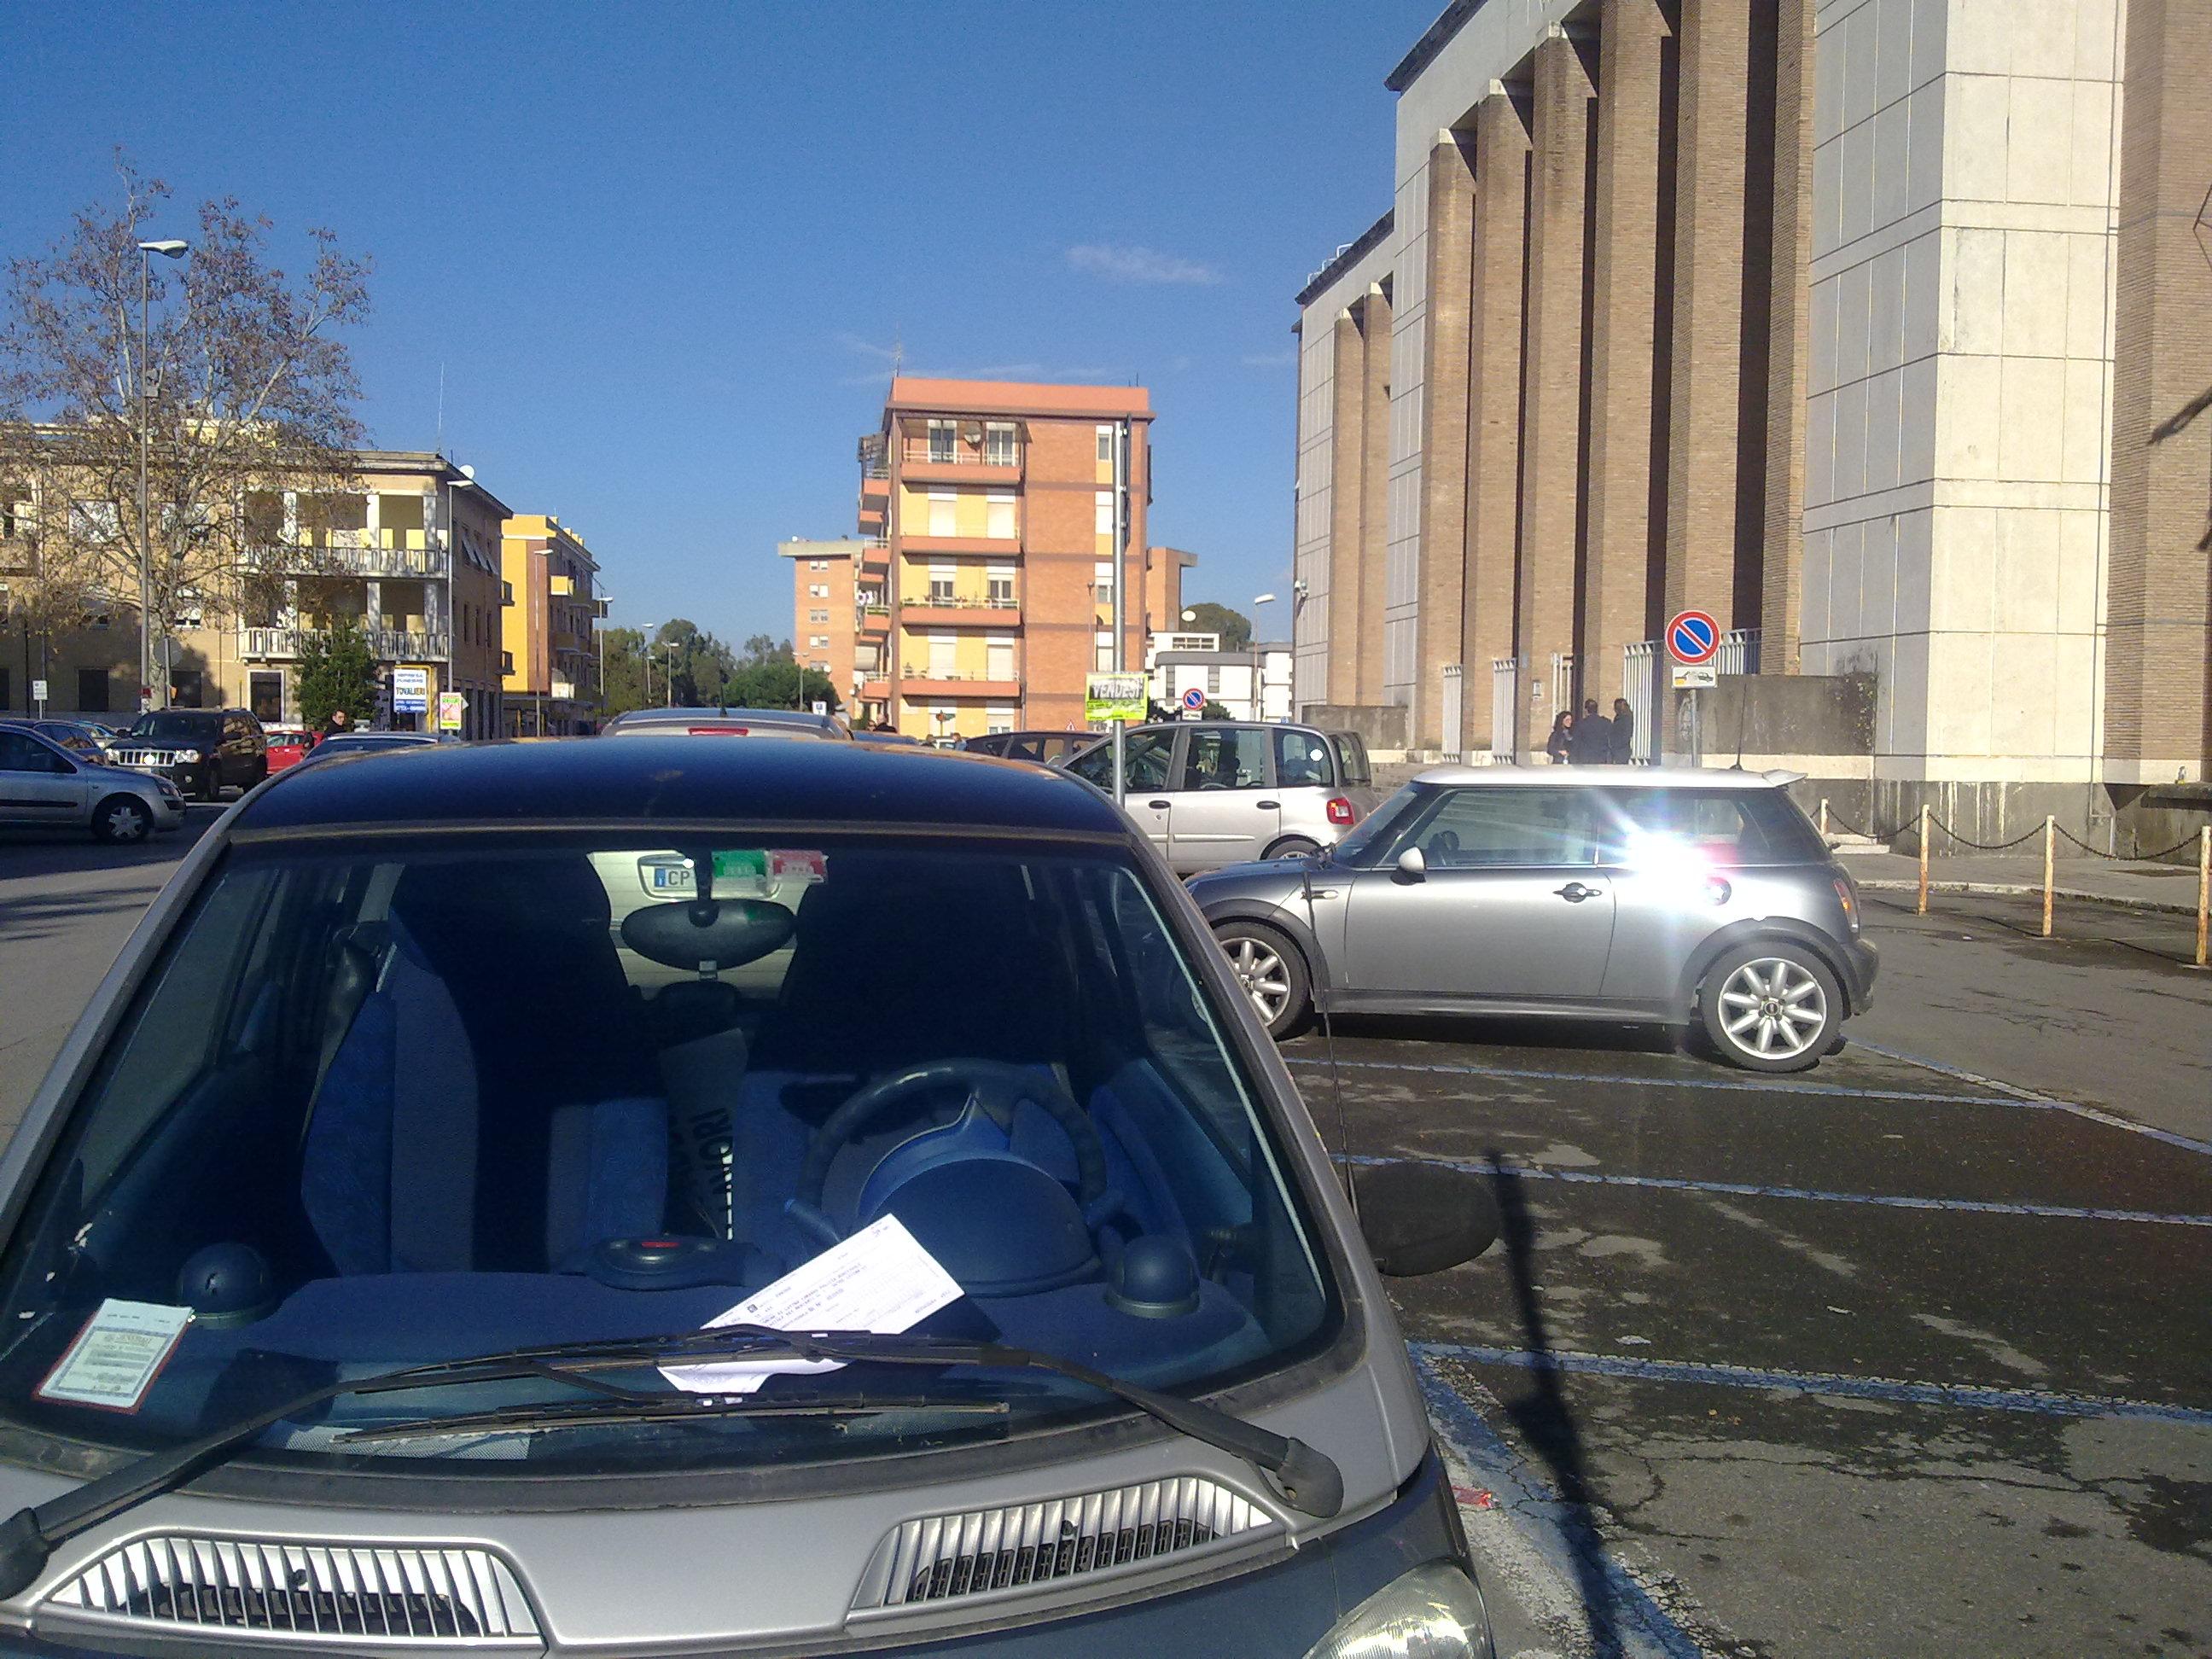 multa-auto-parcheggio-tribunale-latina-35655667